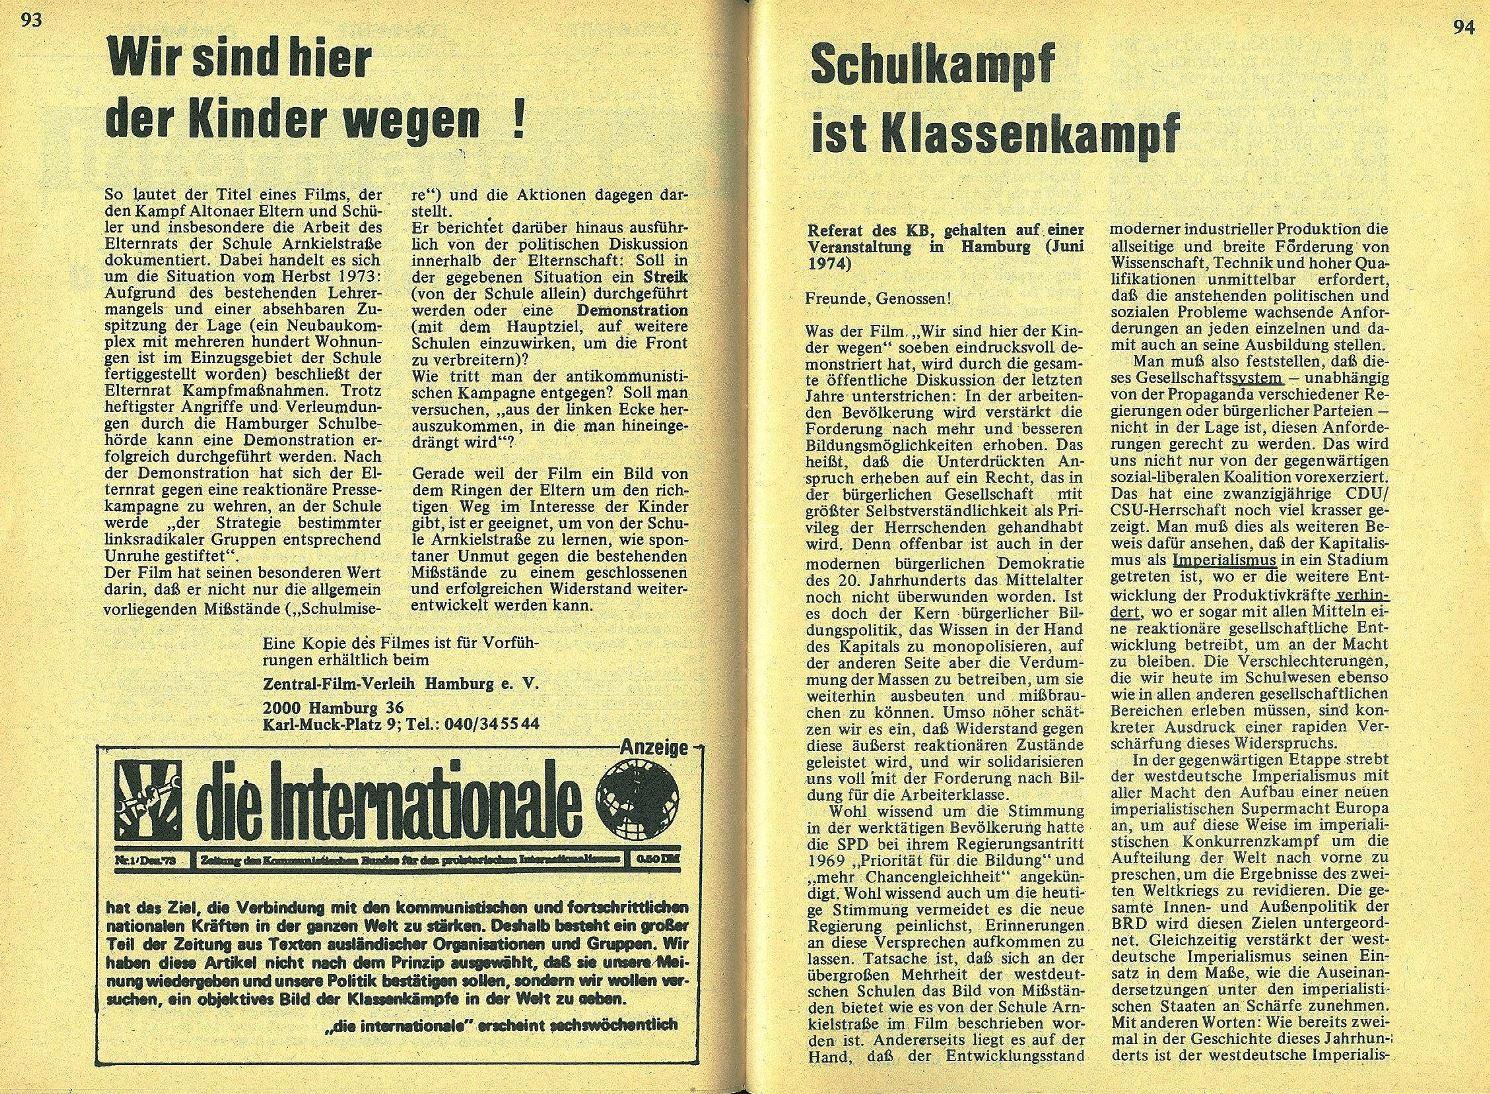 KB_Schulkampf051